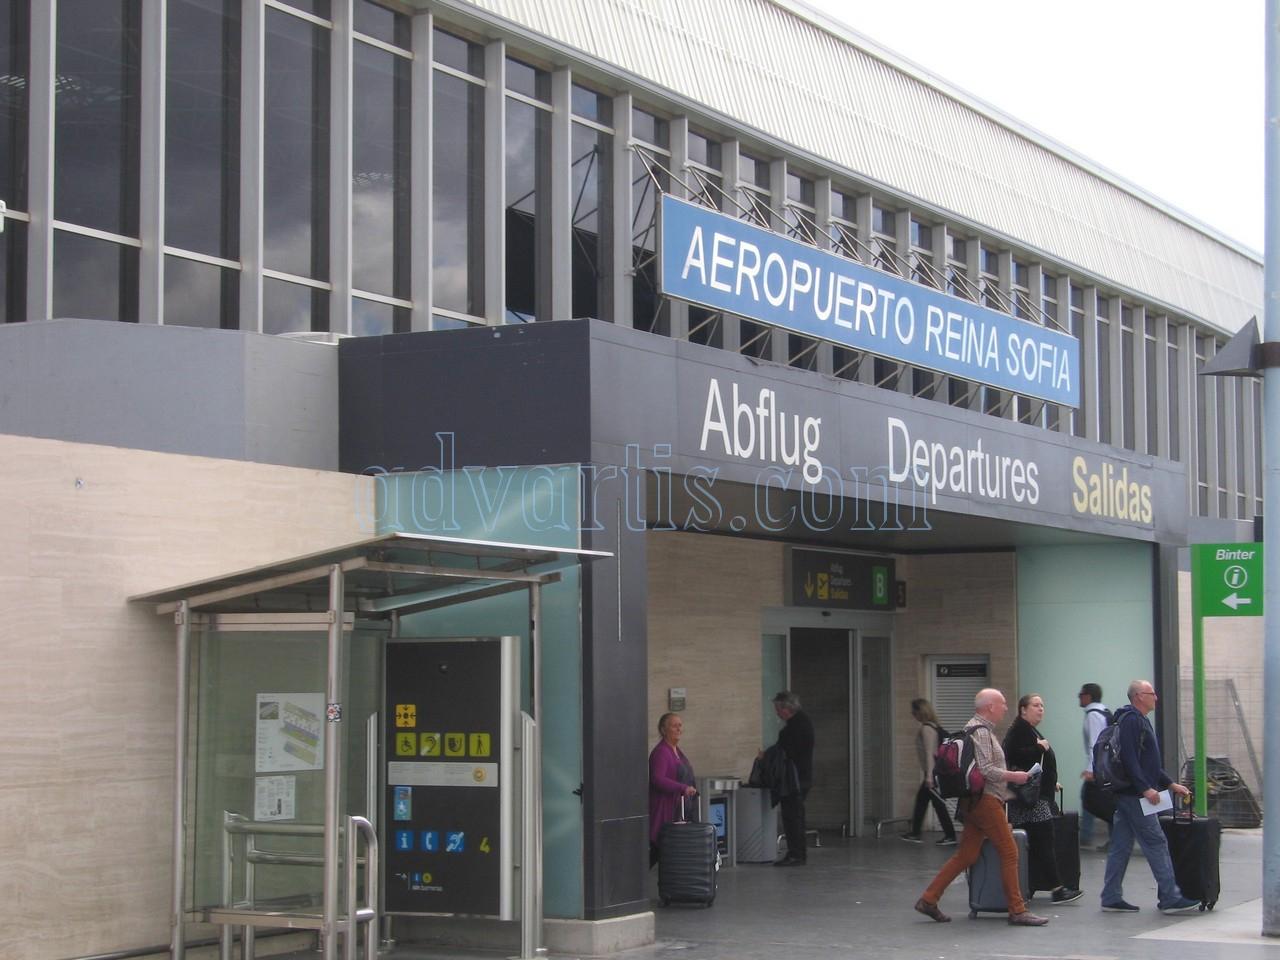 Tenerife south airport Departures